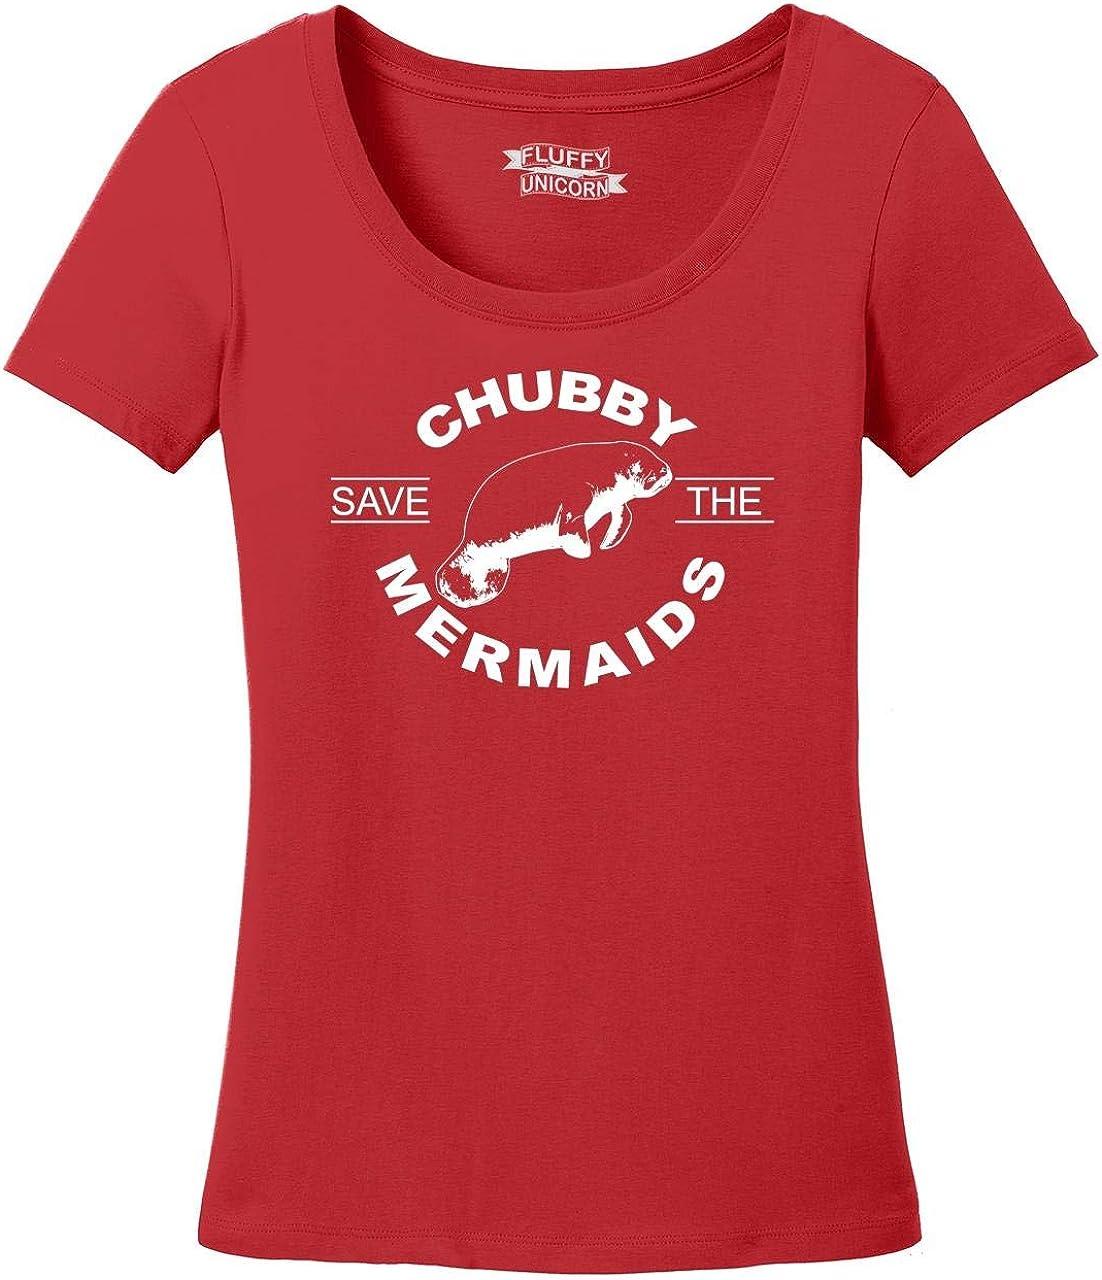 Comical Shirt Ladies Save The Chubby Mermaids Scoop Tee